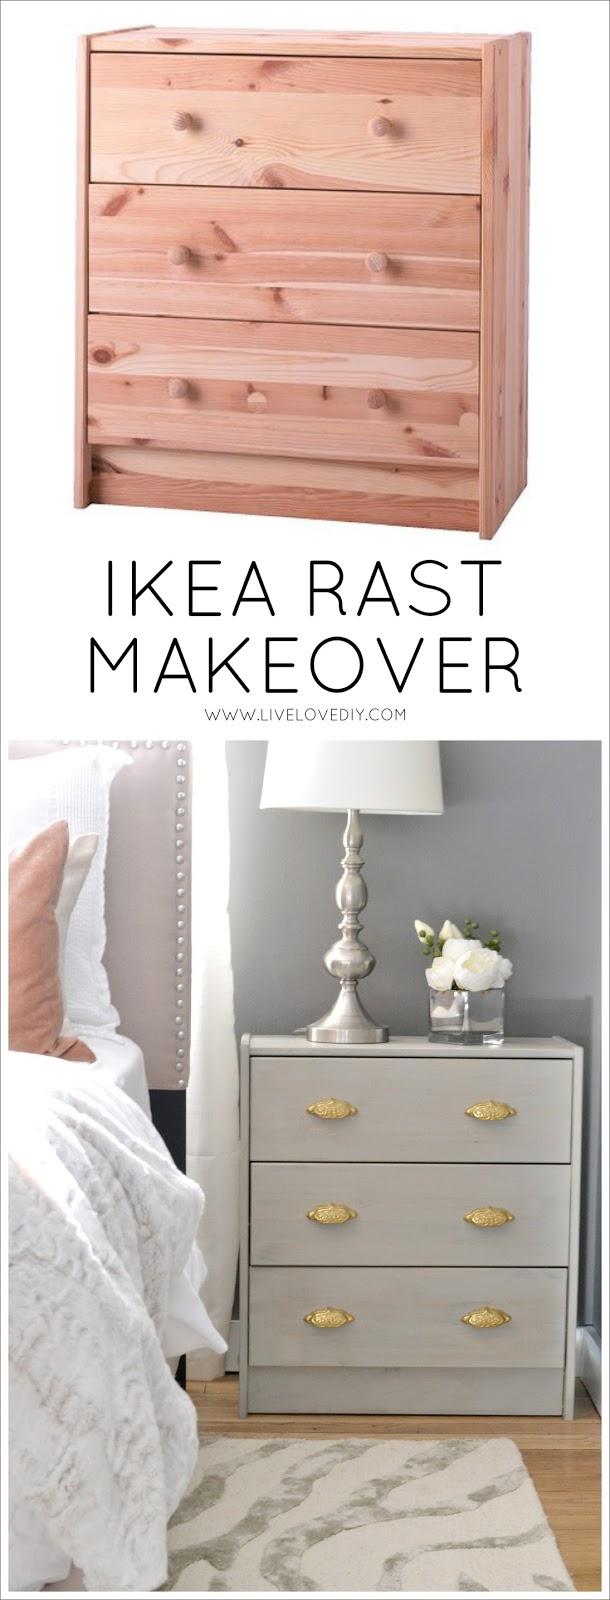 Livelovediy Diy Ikea Rast Makeover With Weathered Gray Wood